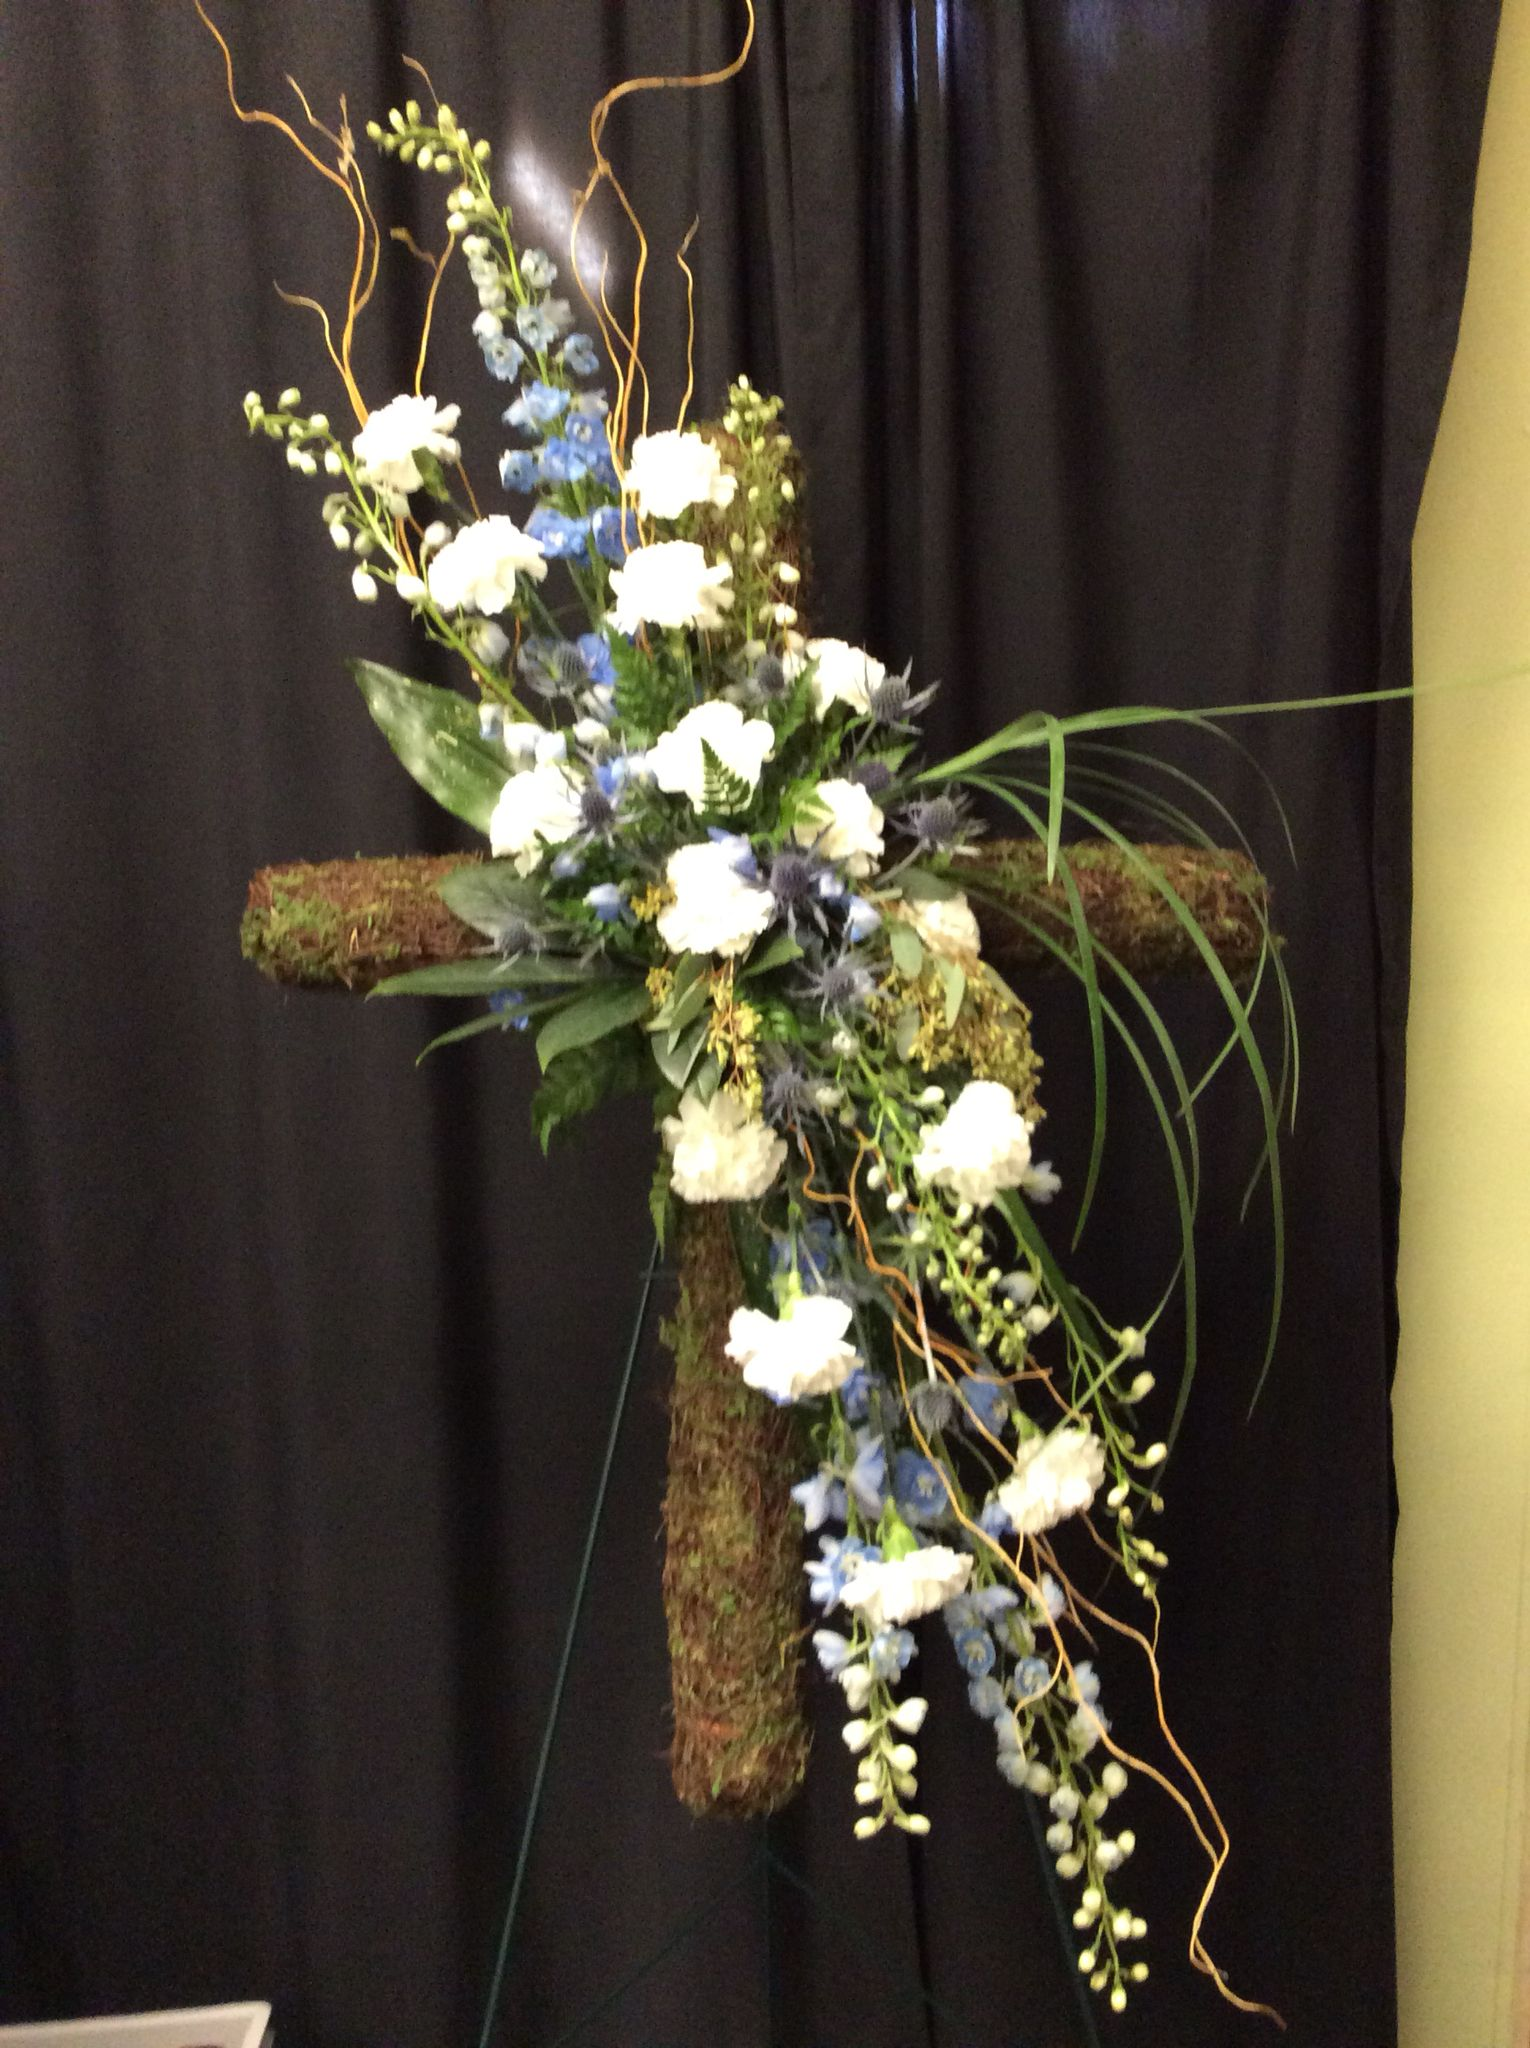 Sympathy cross funeral flowers pinterest funeral flowers and sympathy cross izmirmasajfo Image collections